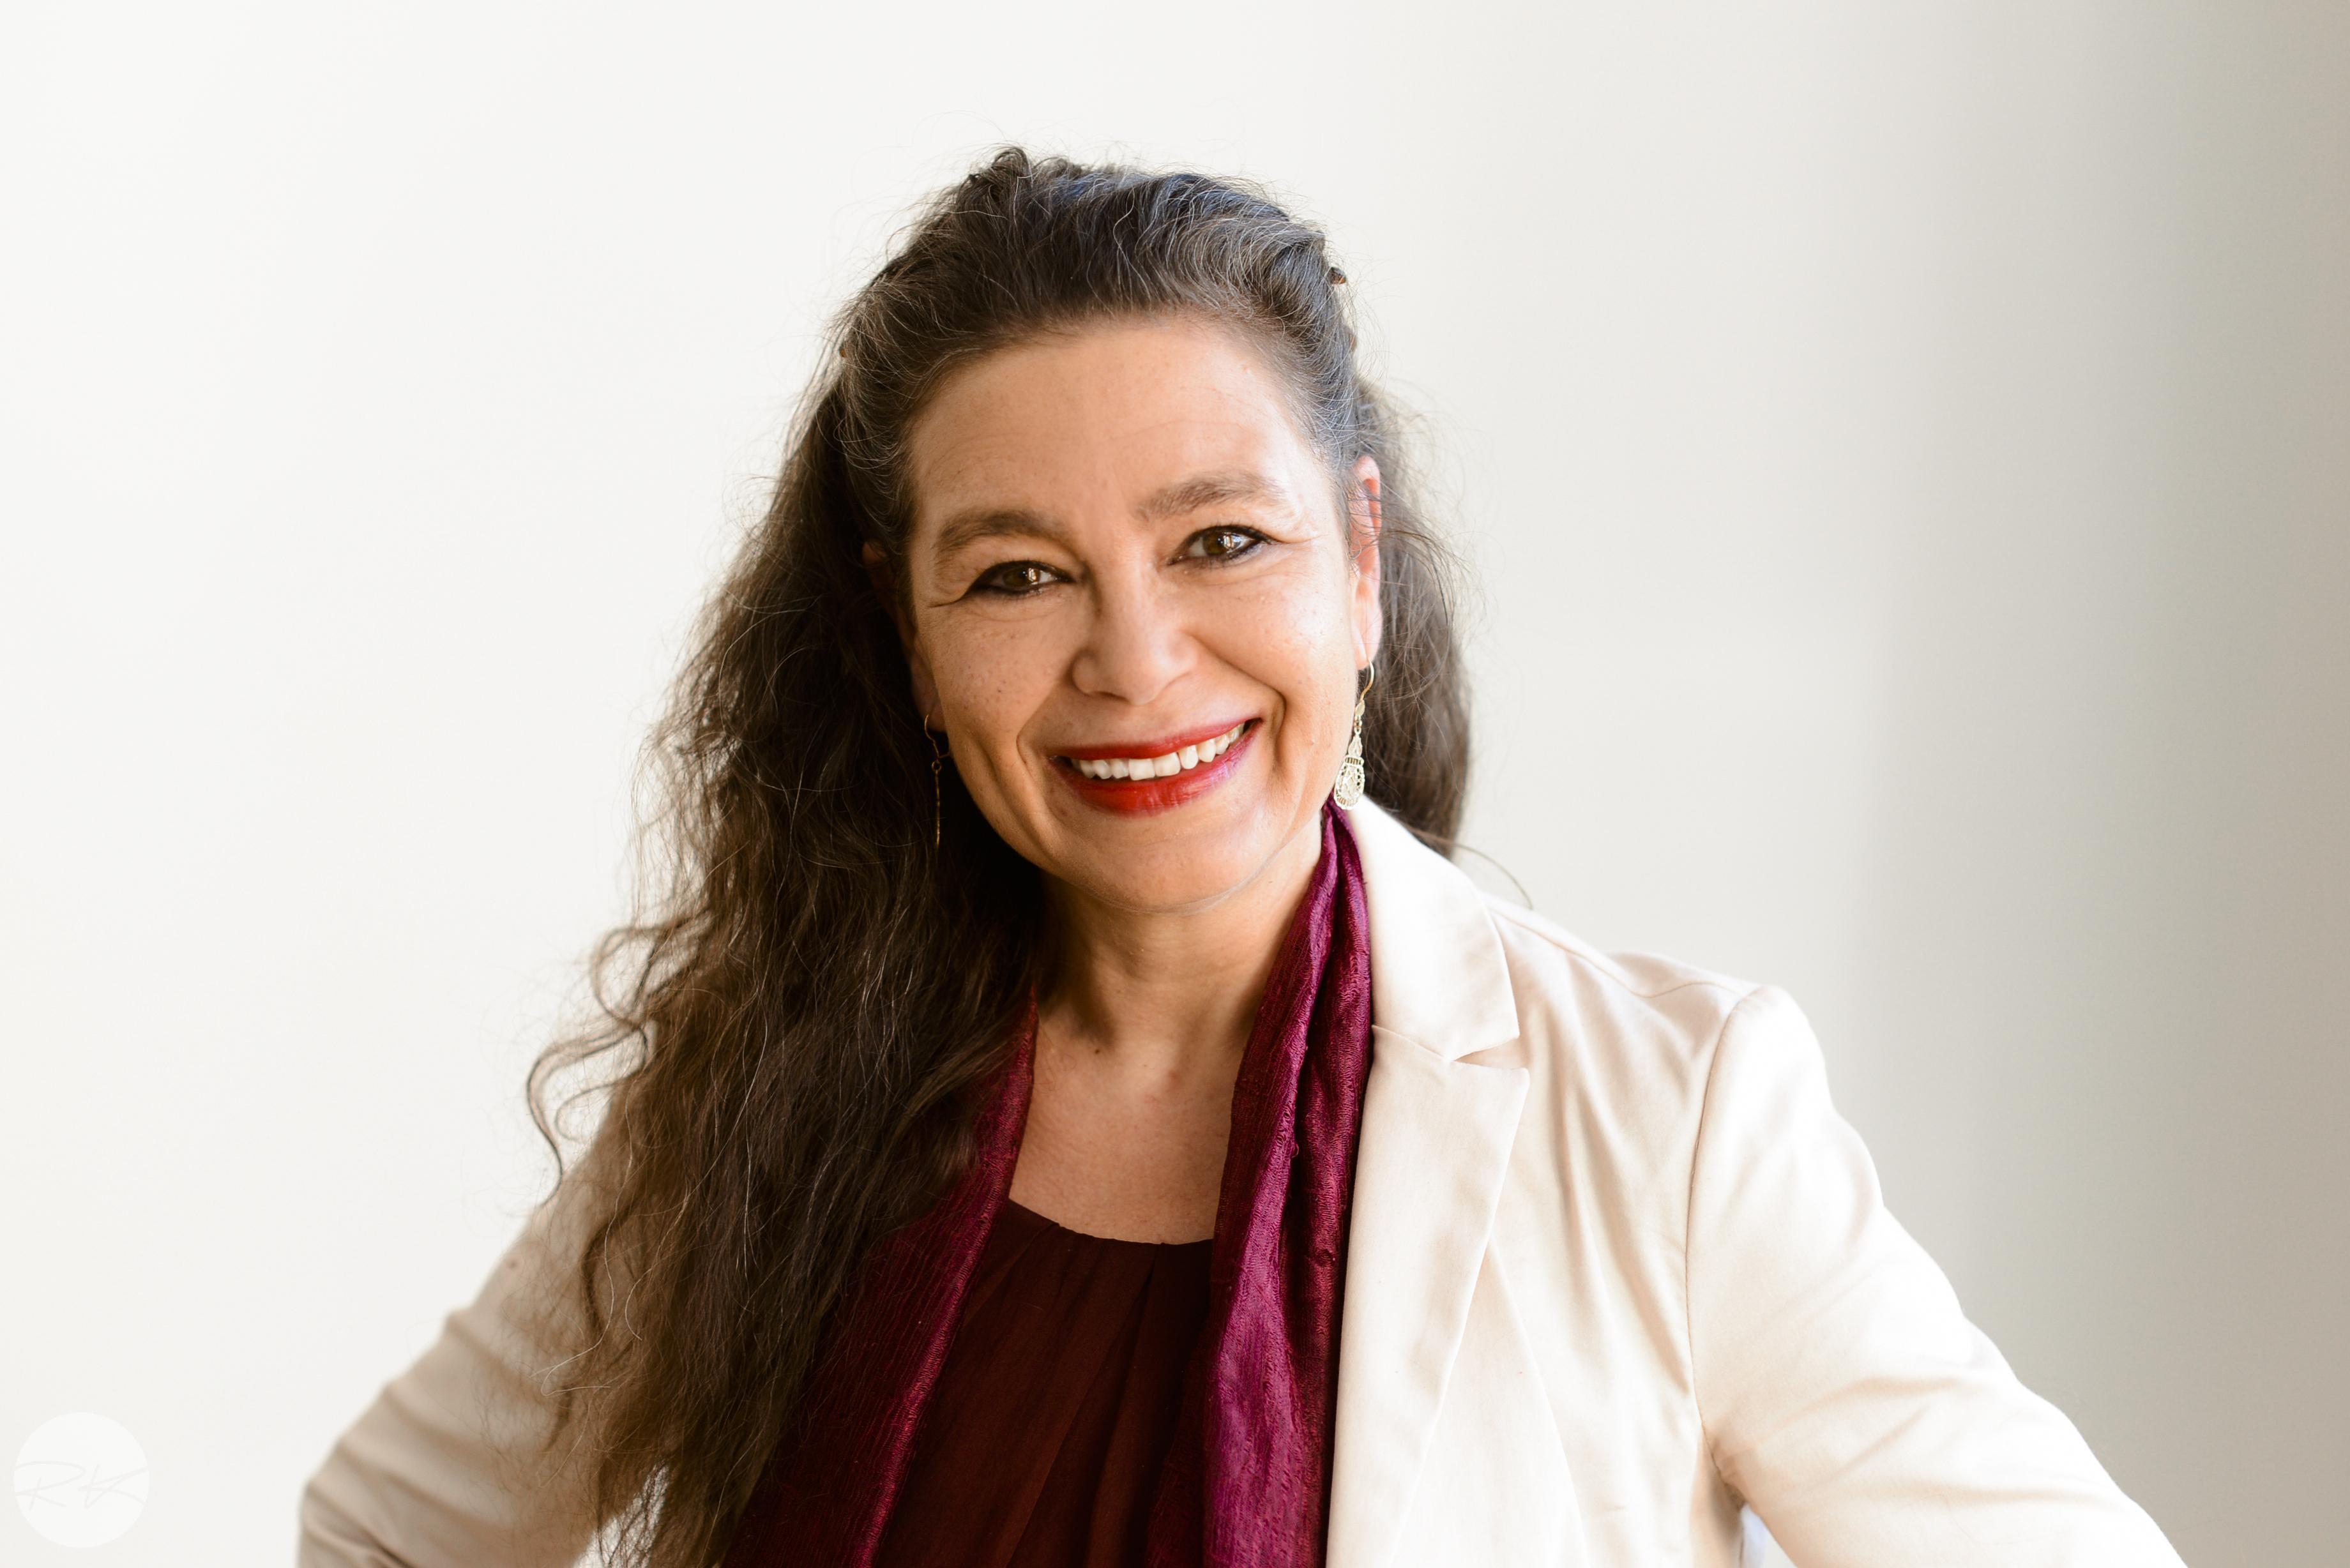 Karen J. Tabbara